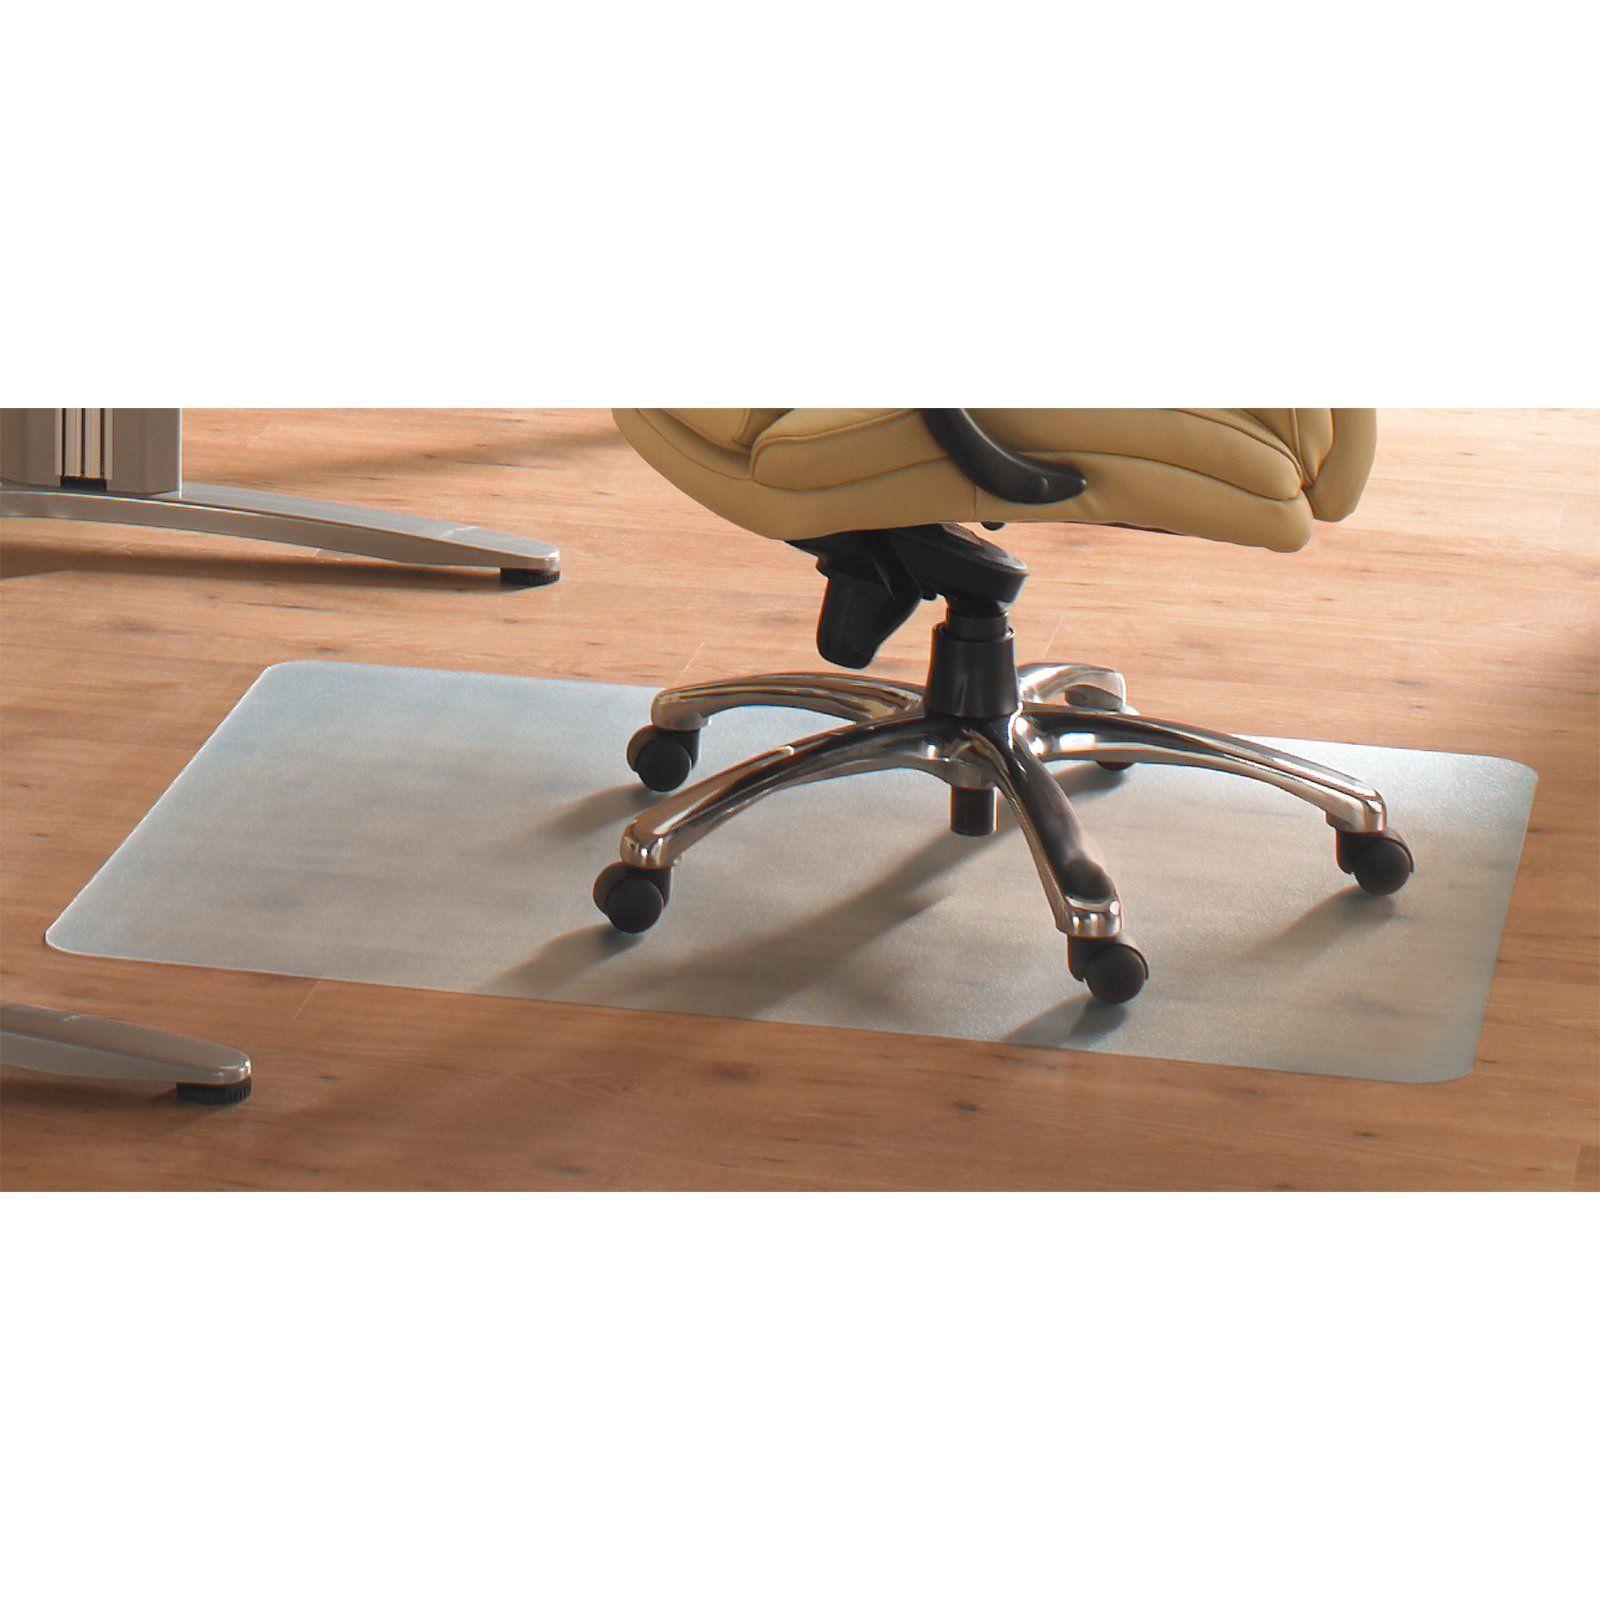 Floortex Ecotex RevolutionMat Recycled Chairmat Rectangular for Hard Floors   fr…